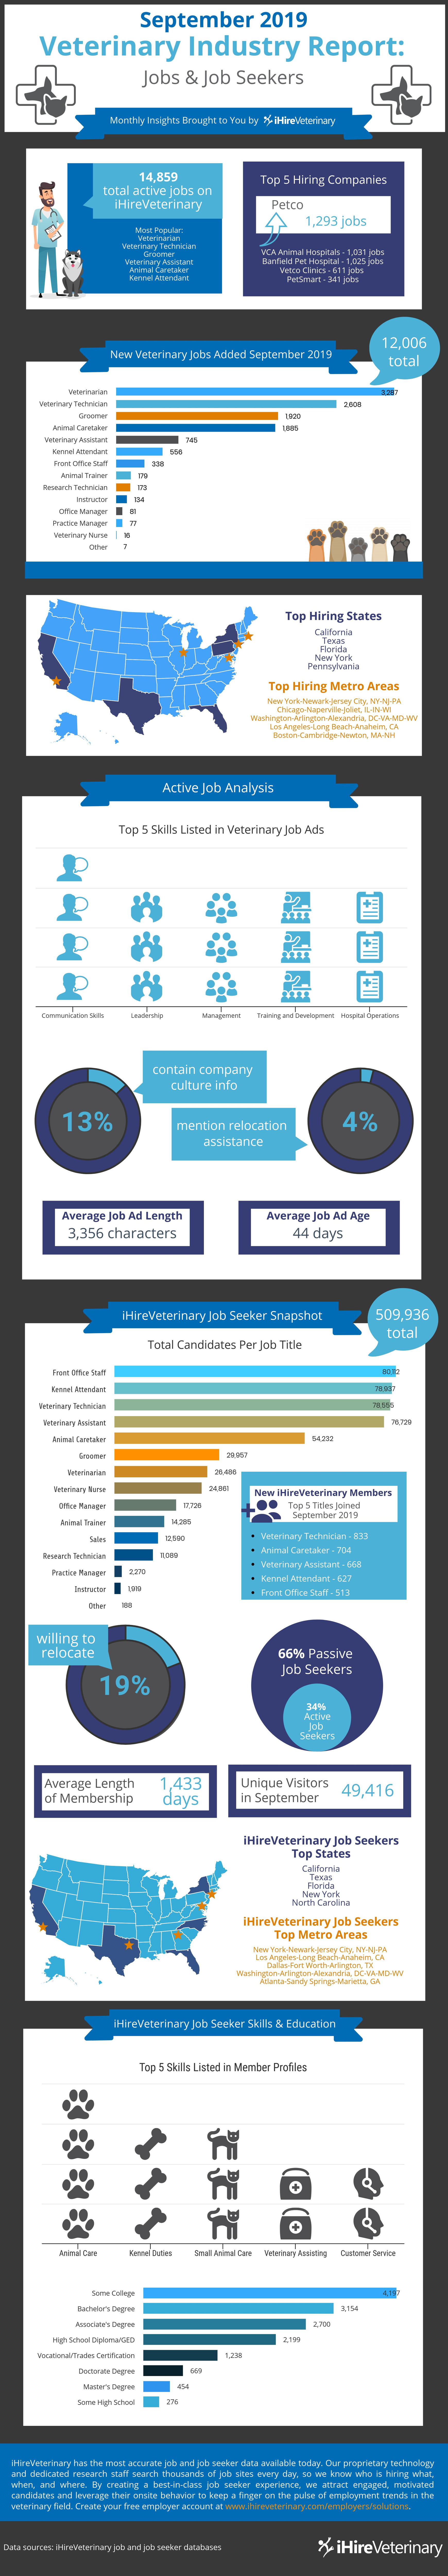 ihireveterinary september 2019 veterinary industry infographic